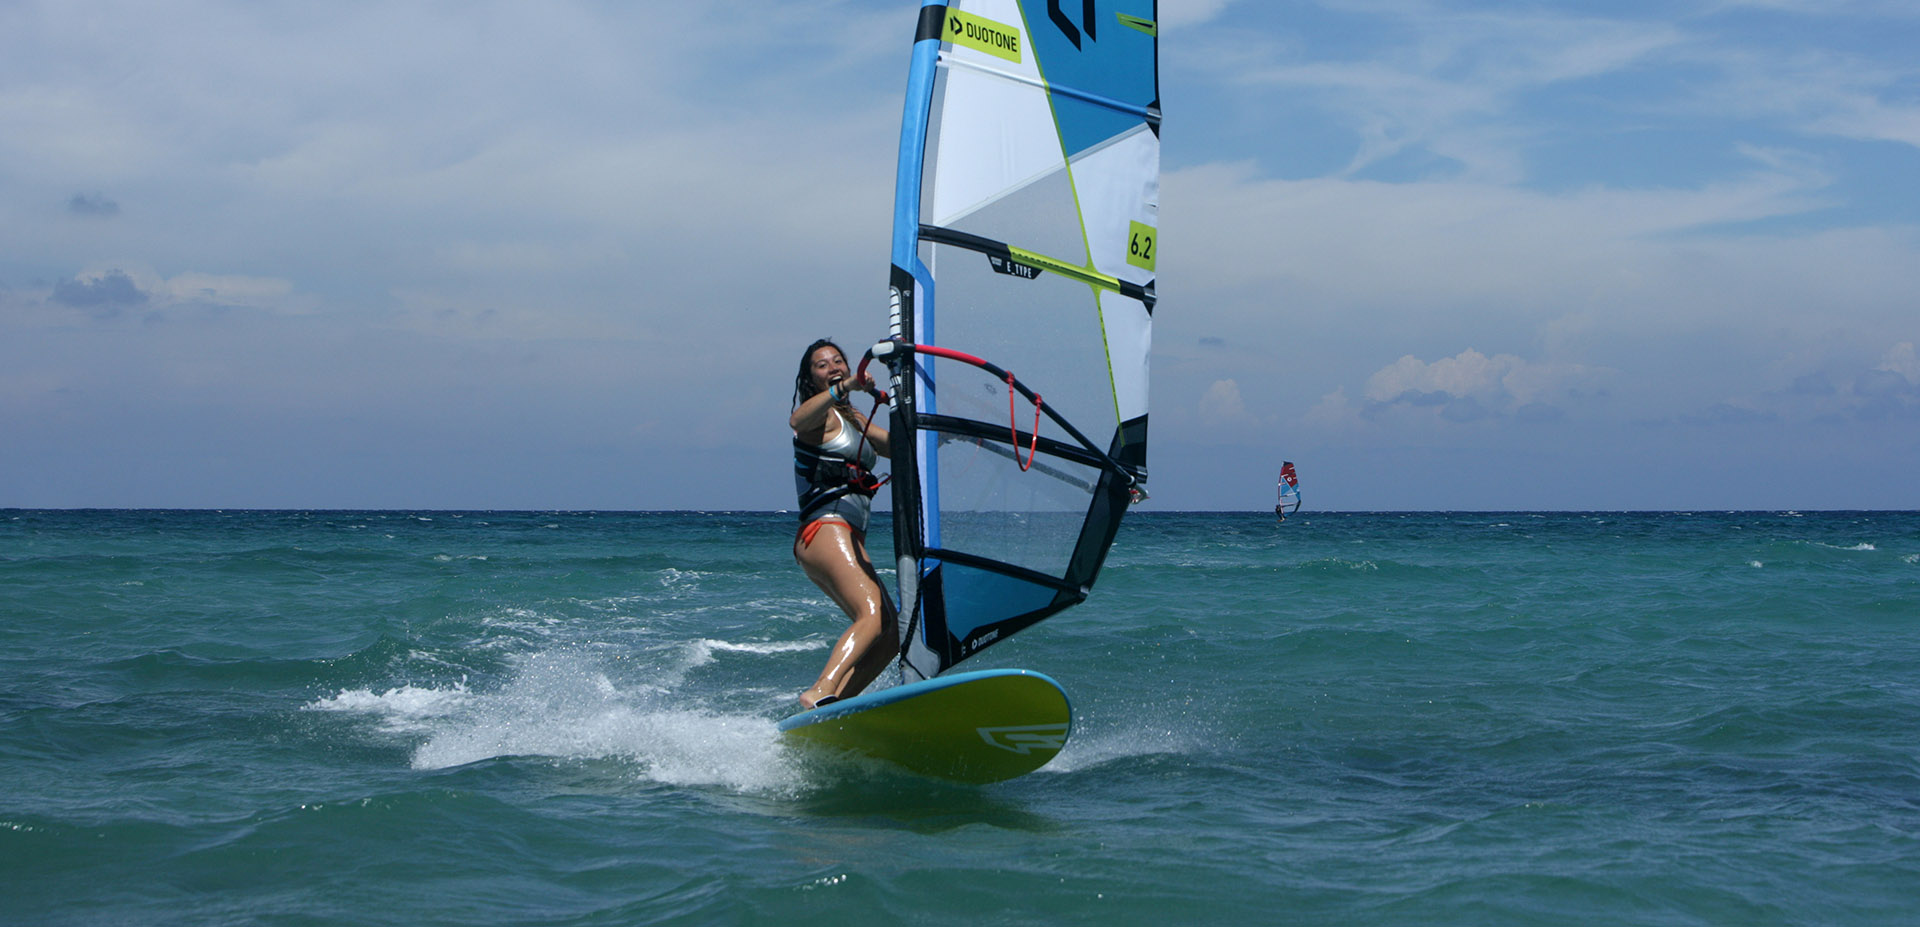 iniziare-a-praticare-windsurf